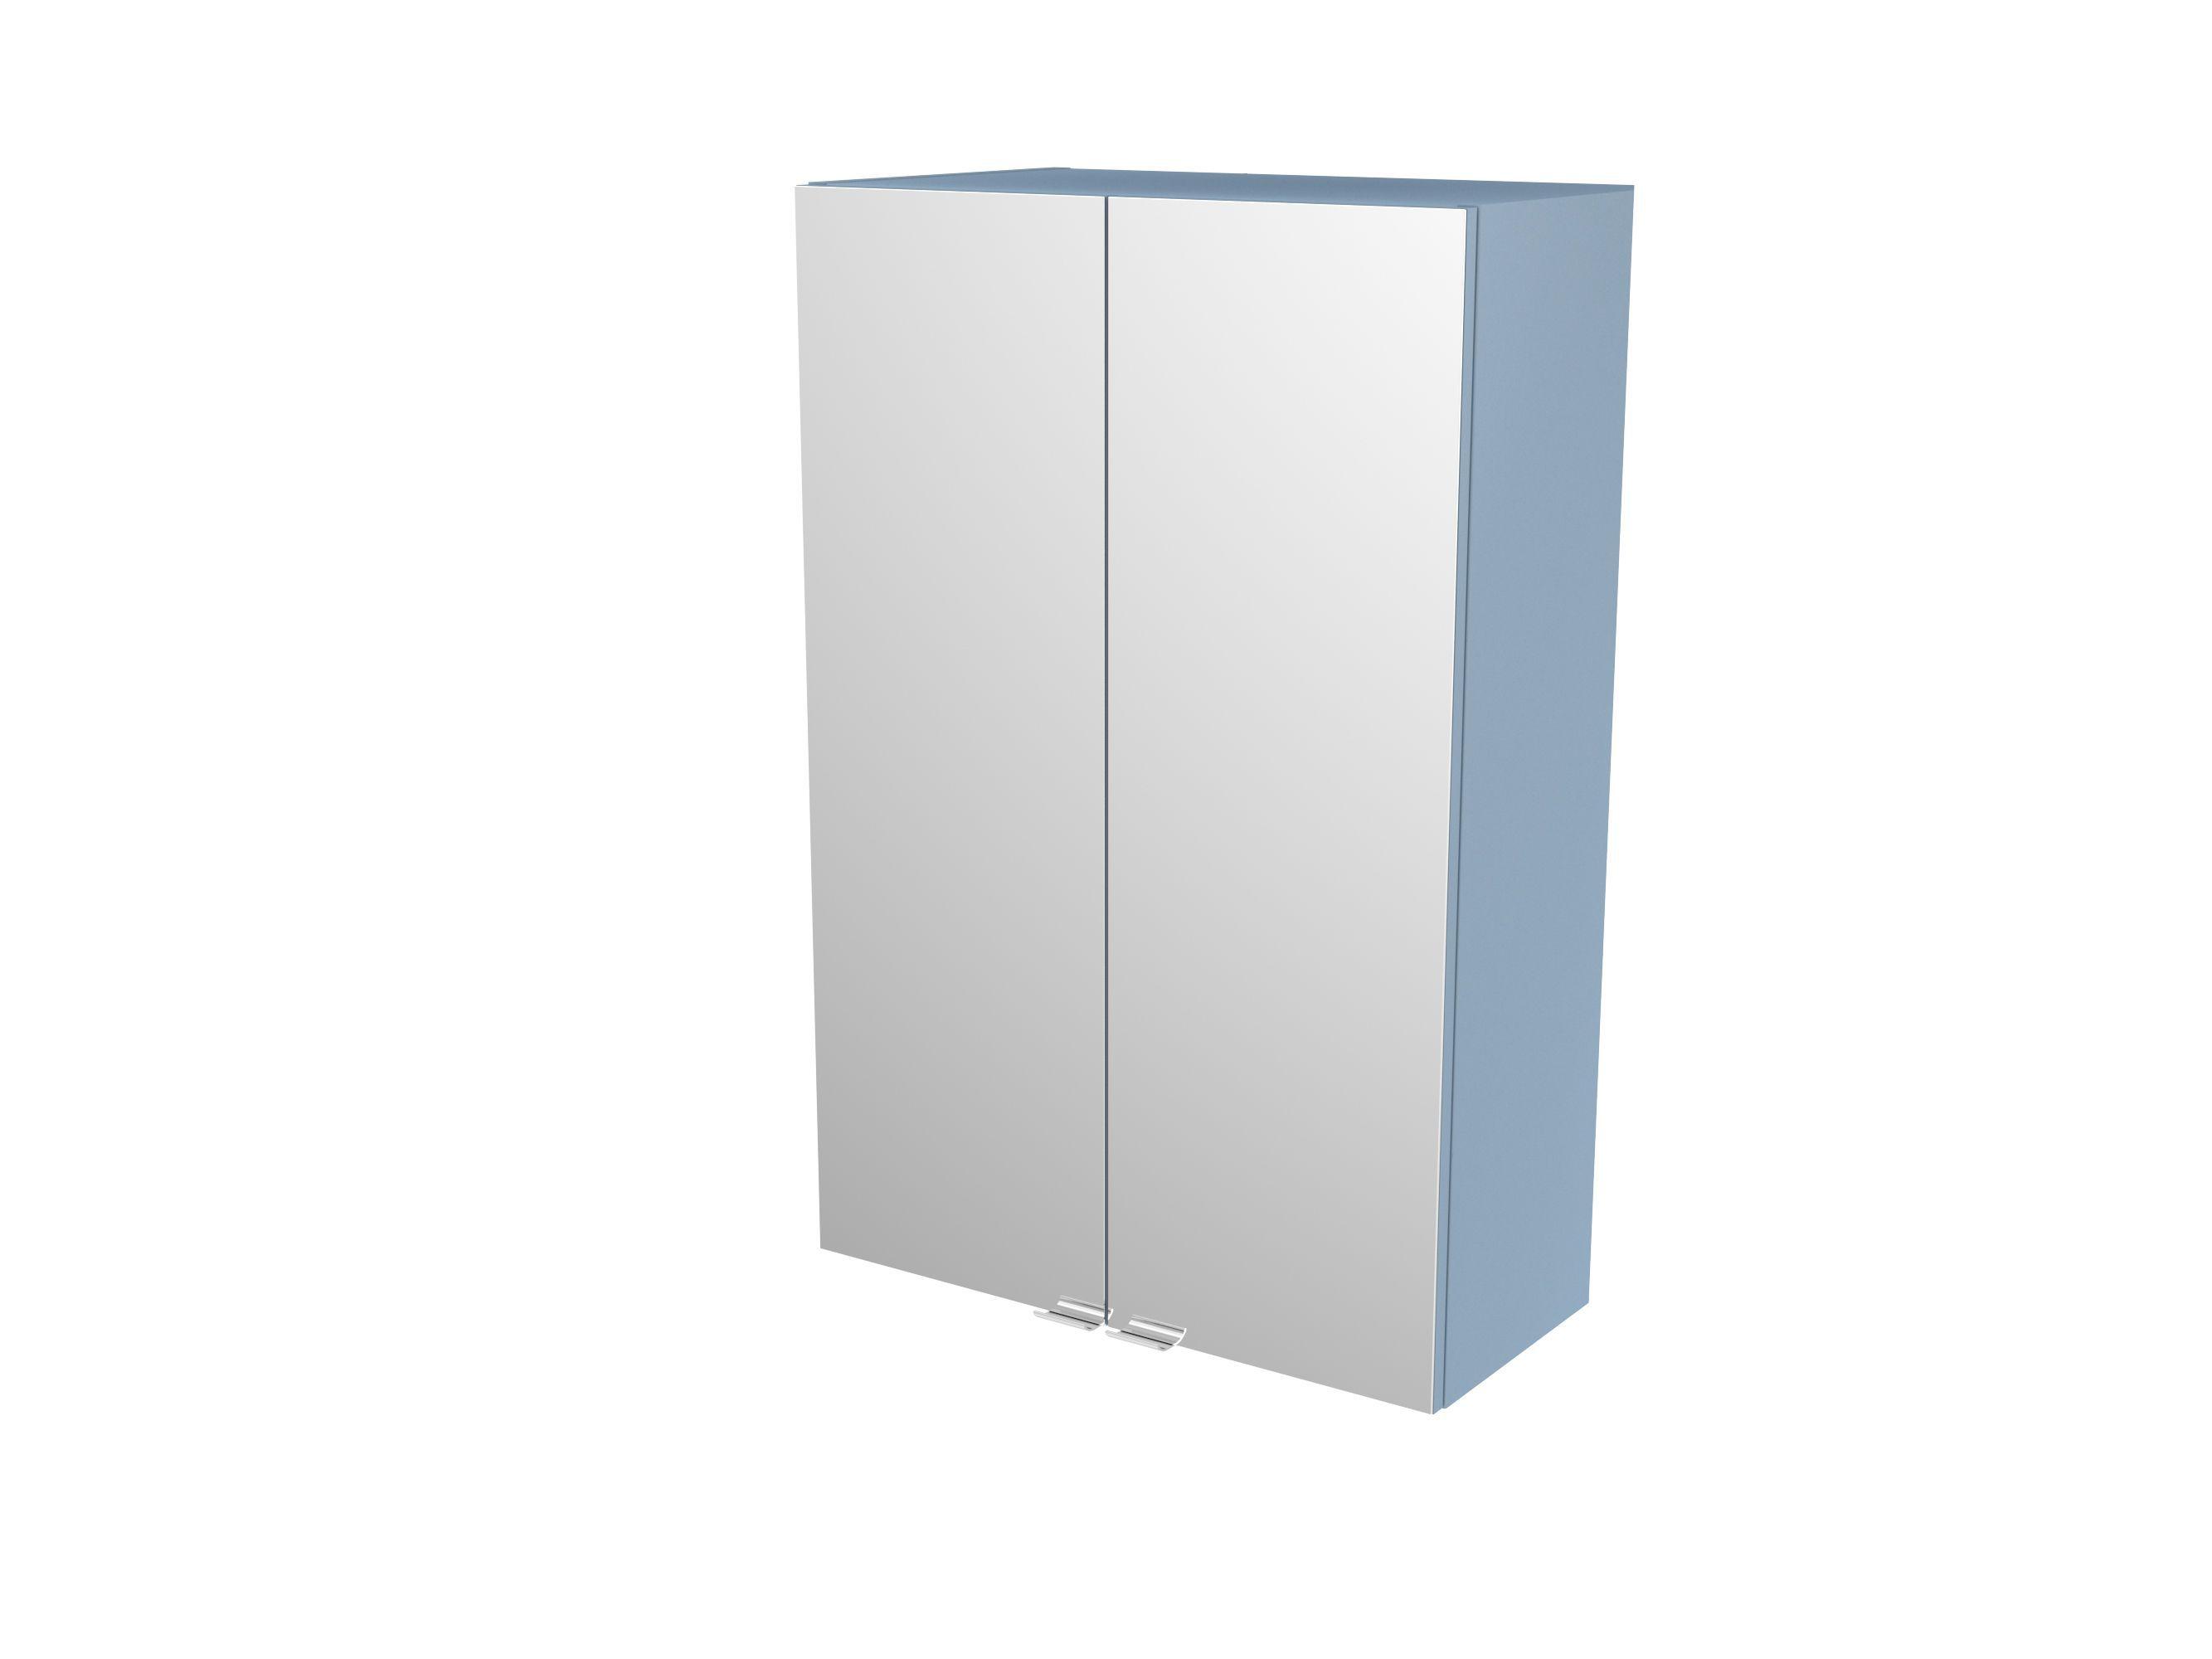 Cooke & Lewis Imandra Gloss Blue Deep Mirrored Wall Cabinet, (w)600mm